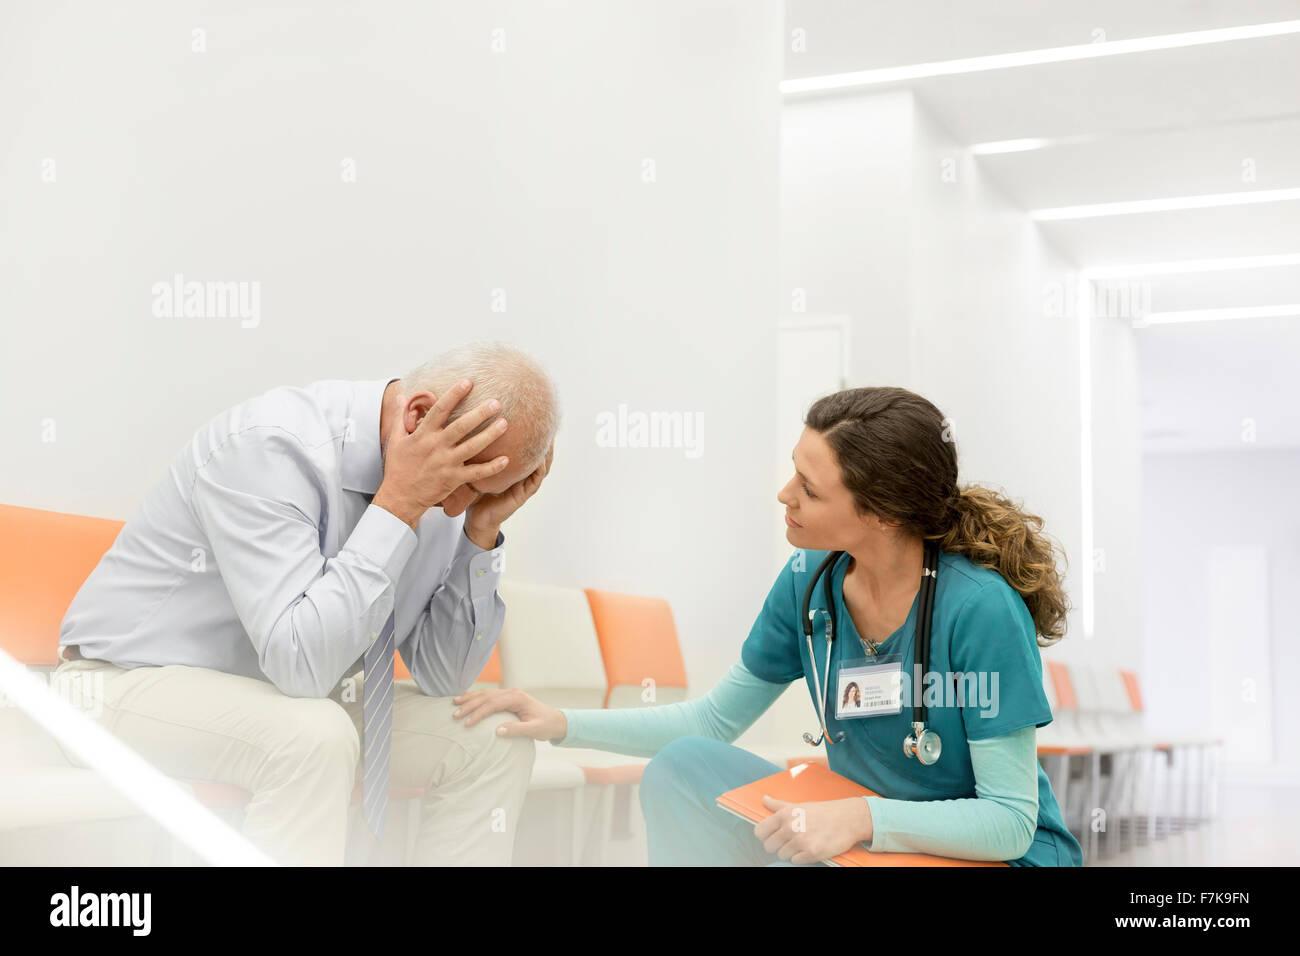 Nurse consoling upset man in clinic corridor - Stock Image